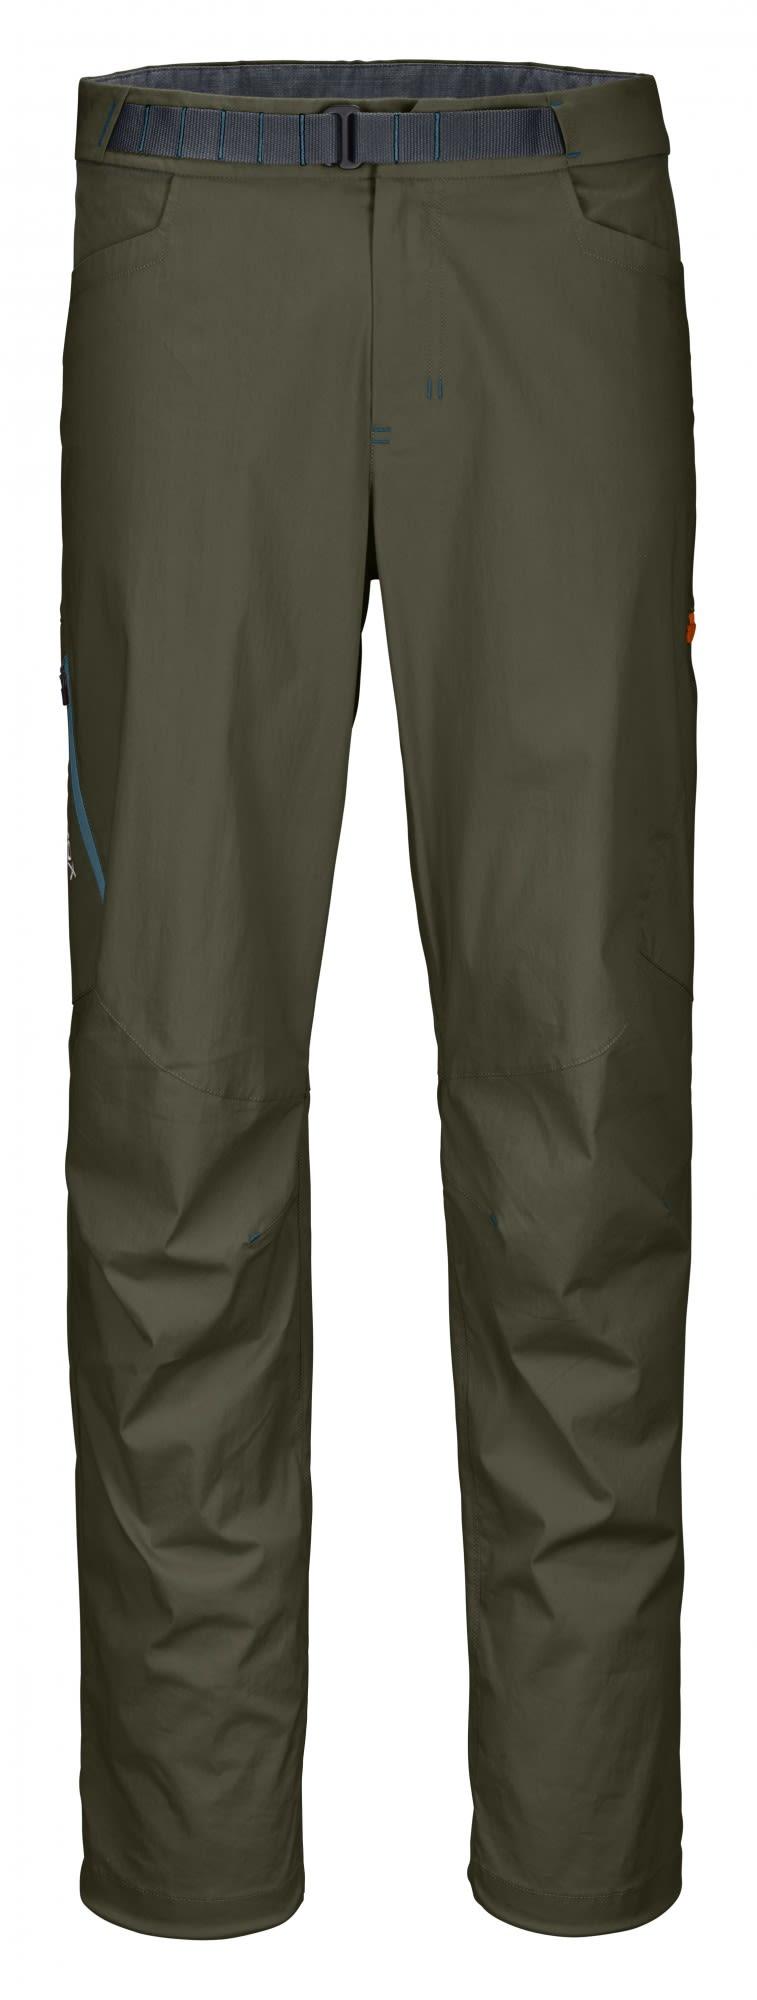 Ortovox Merino Shield Canvas Light Colodri Pants Oliv, Male Merino Hose, XL